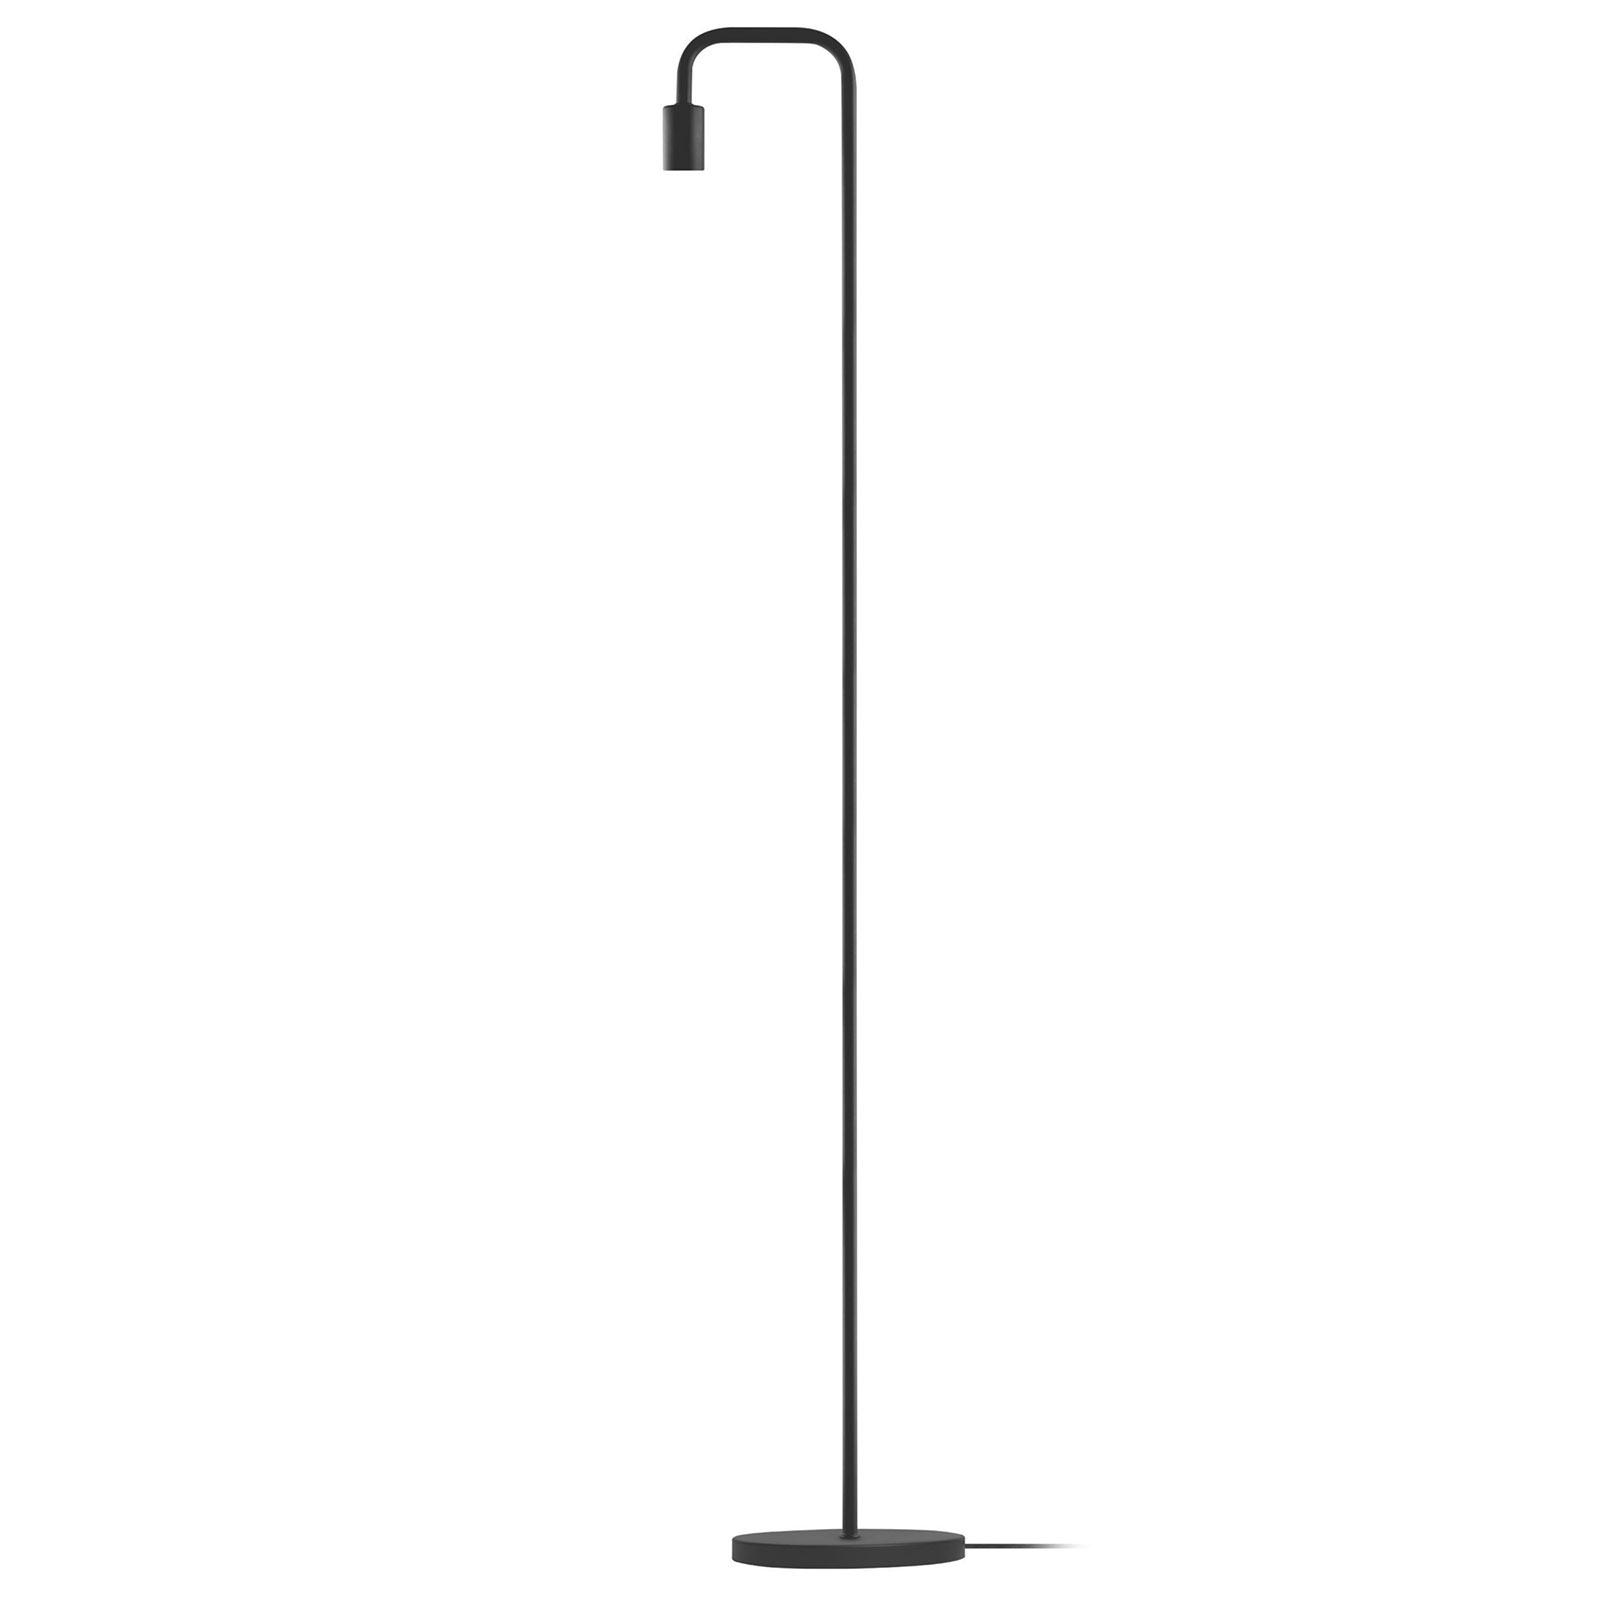 LEDVANCE Vintage Edition 1906 Stehlampe Pipe Floor